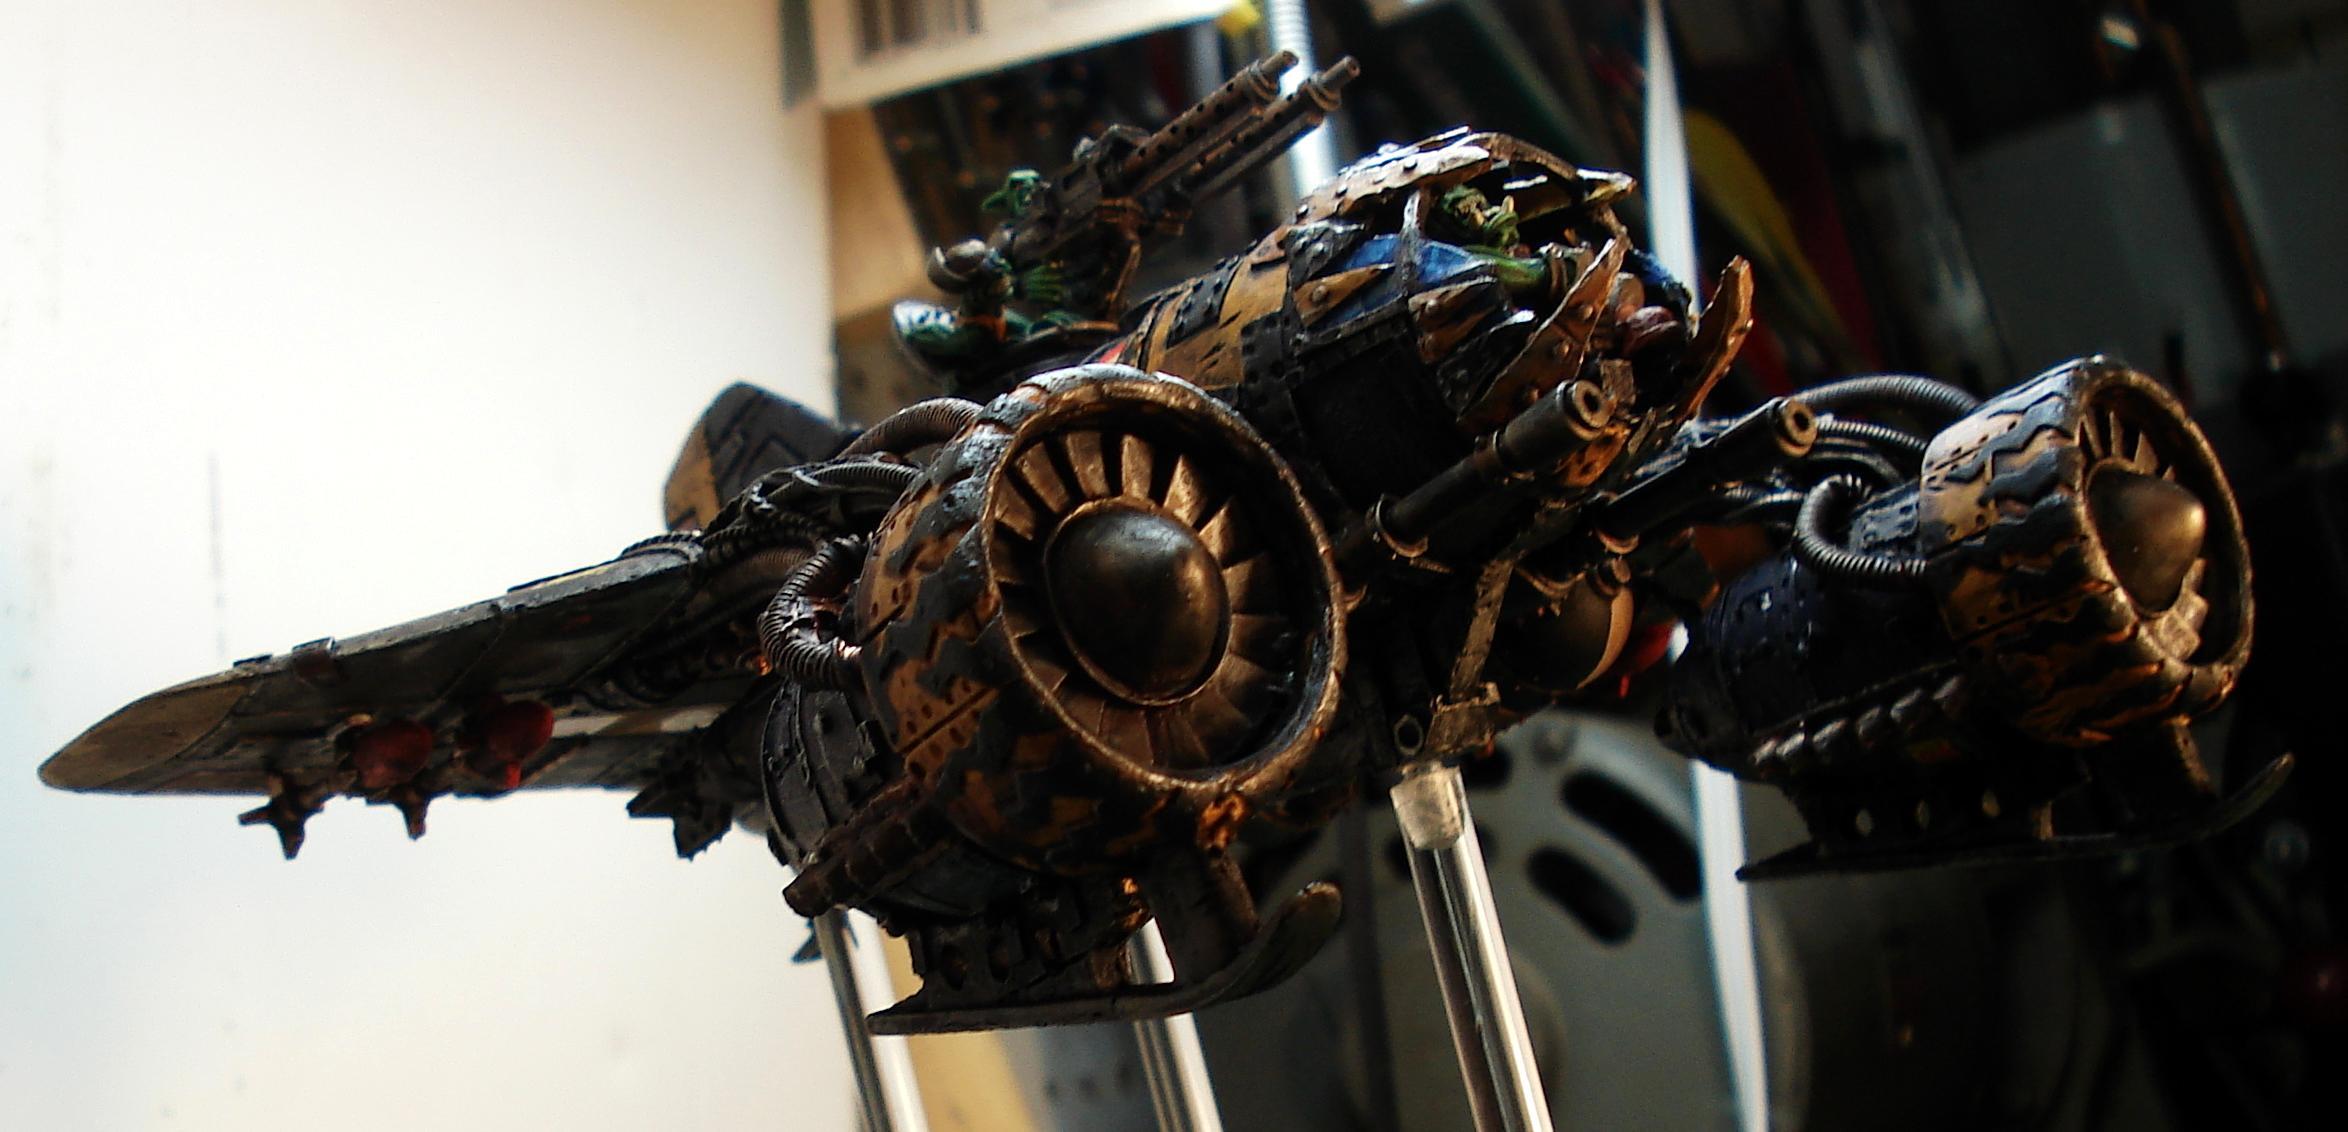 Bad, Blitz, Bomber, Burna Boyz, Claw, Comission, Custom, Dakka Dakka, Deff, Dreadnought, Field, Force, Jet, Kustom, Moons, Orks, Scrap, Space, Space Marines, Trukk